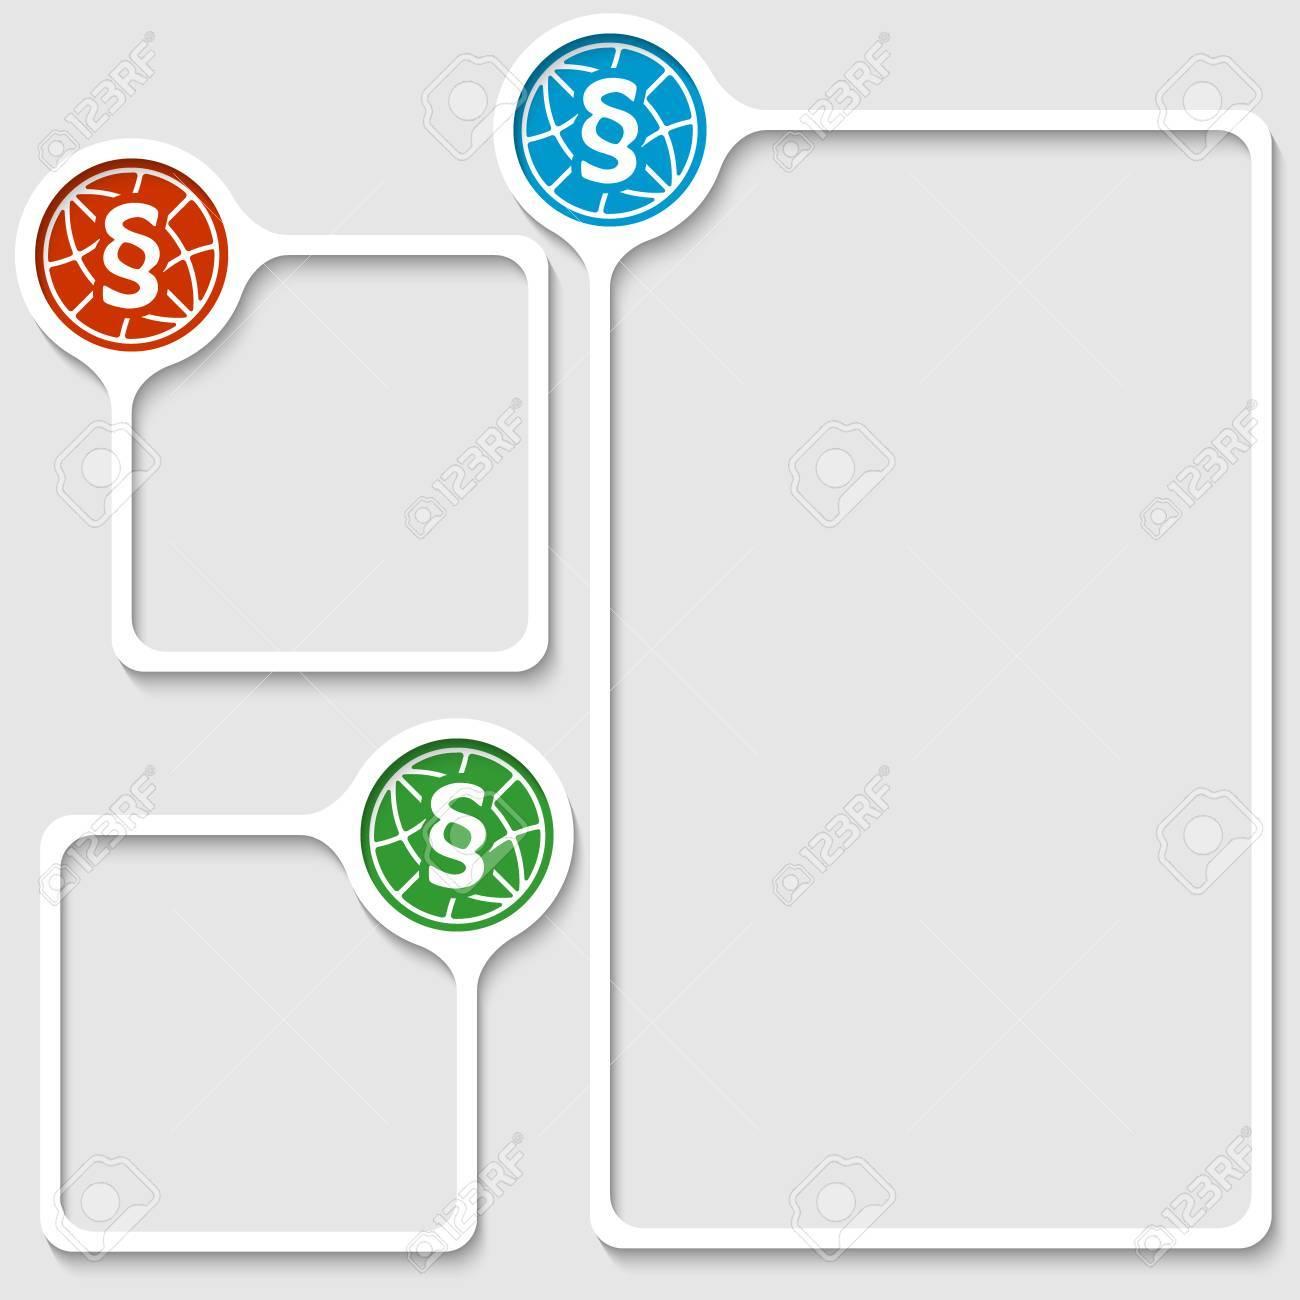 Großartig Ryu Rahmendaten Bilder - Rahmen Ideen - markjohnsonshow.info